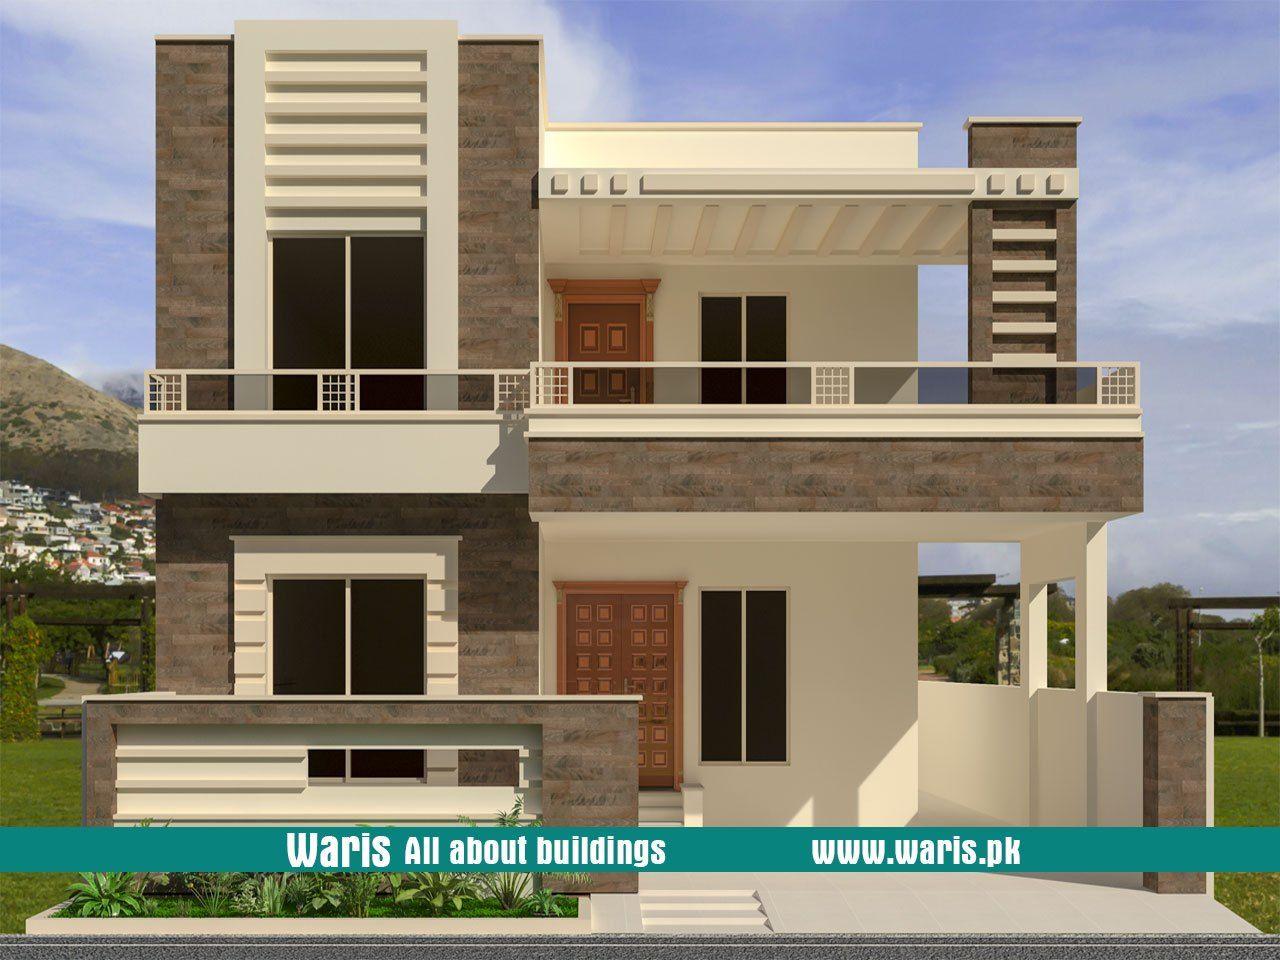 10 Marla 35x65 House Design In Gujranwala Pakistan Duplex House Design House Front Design Architectural House Plans